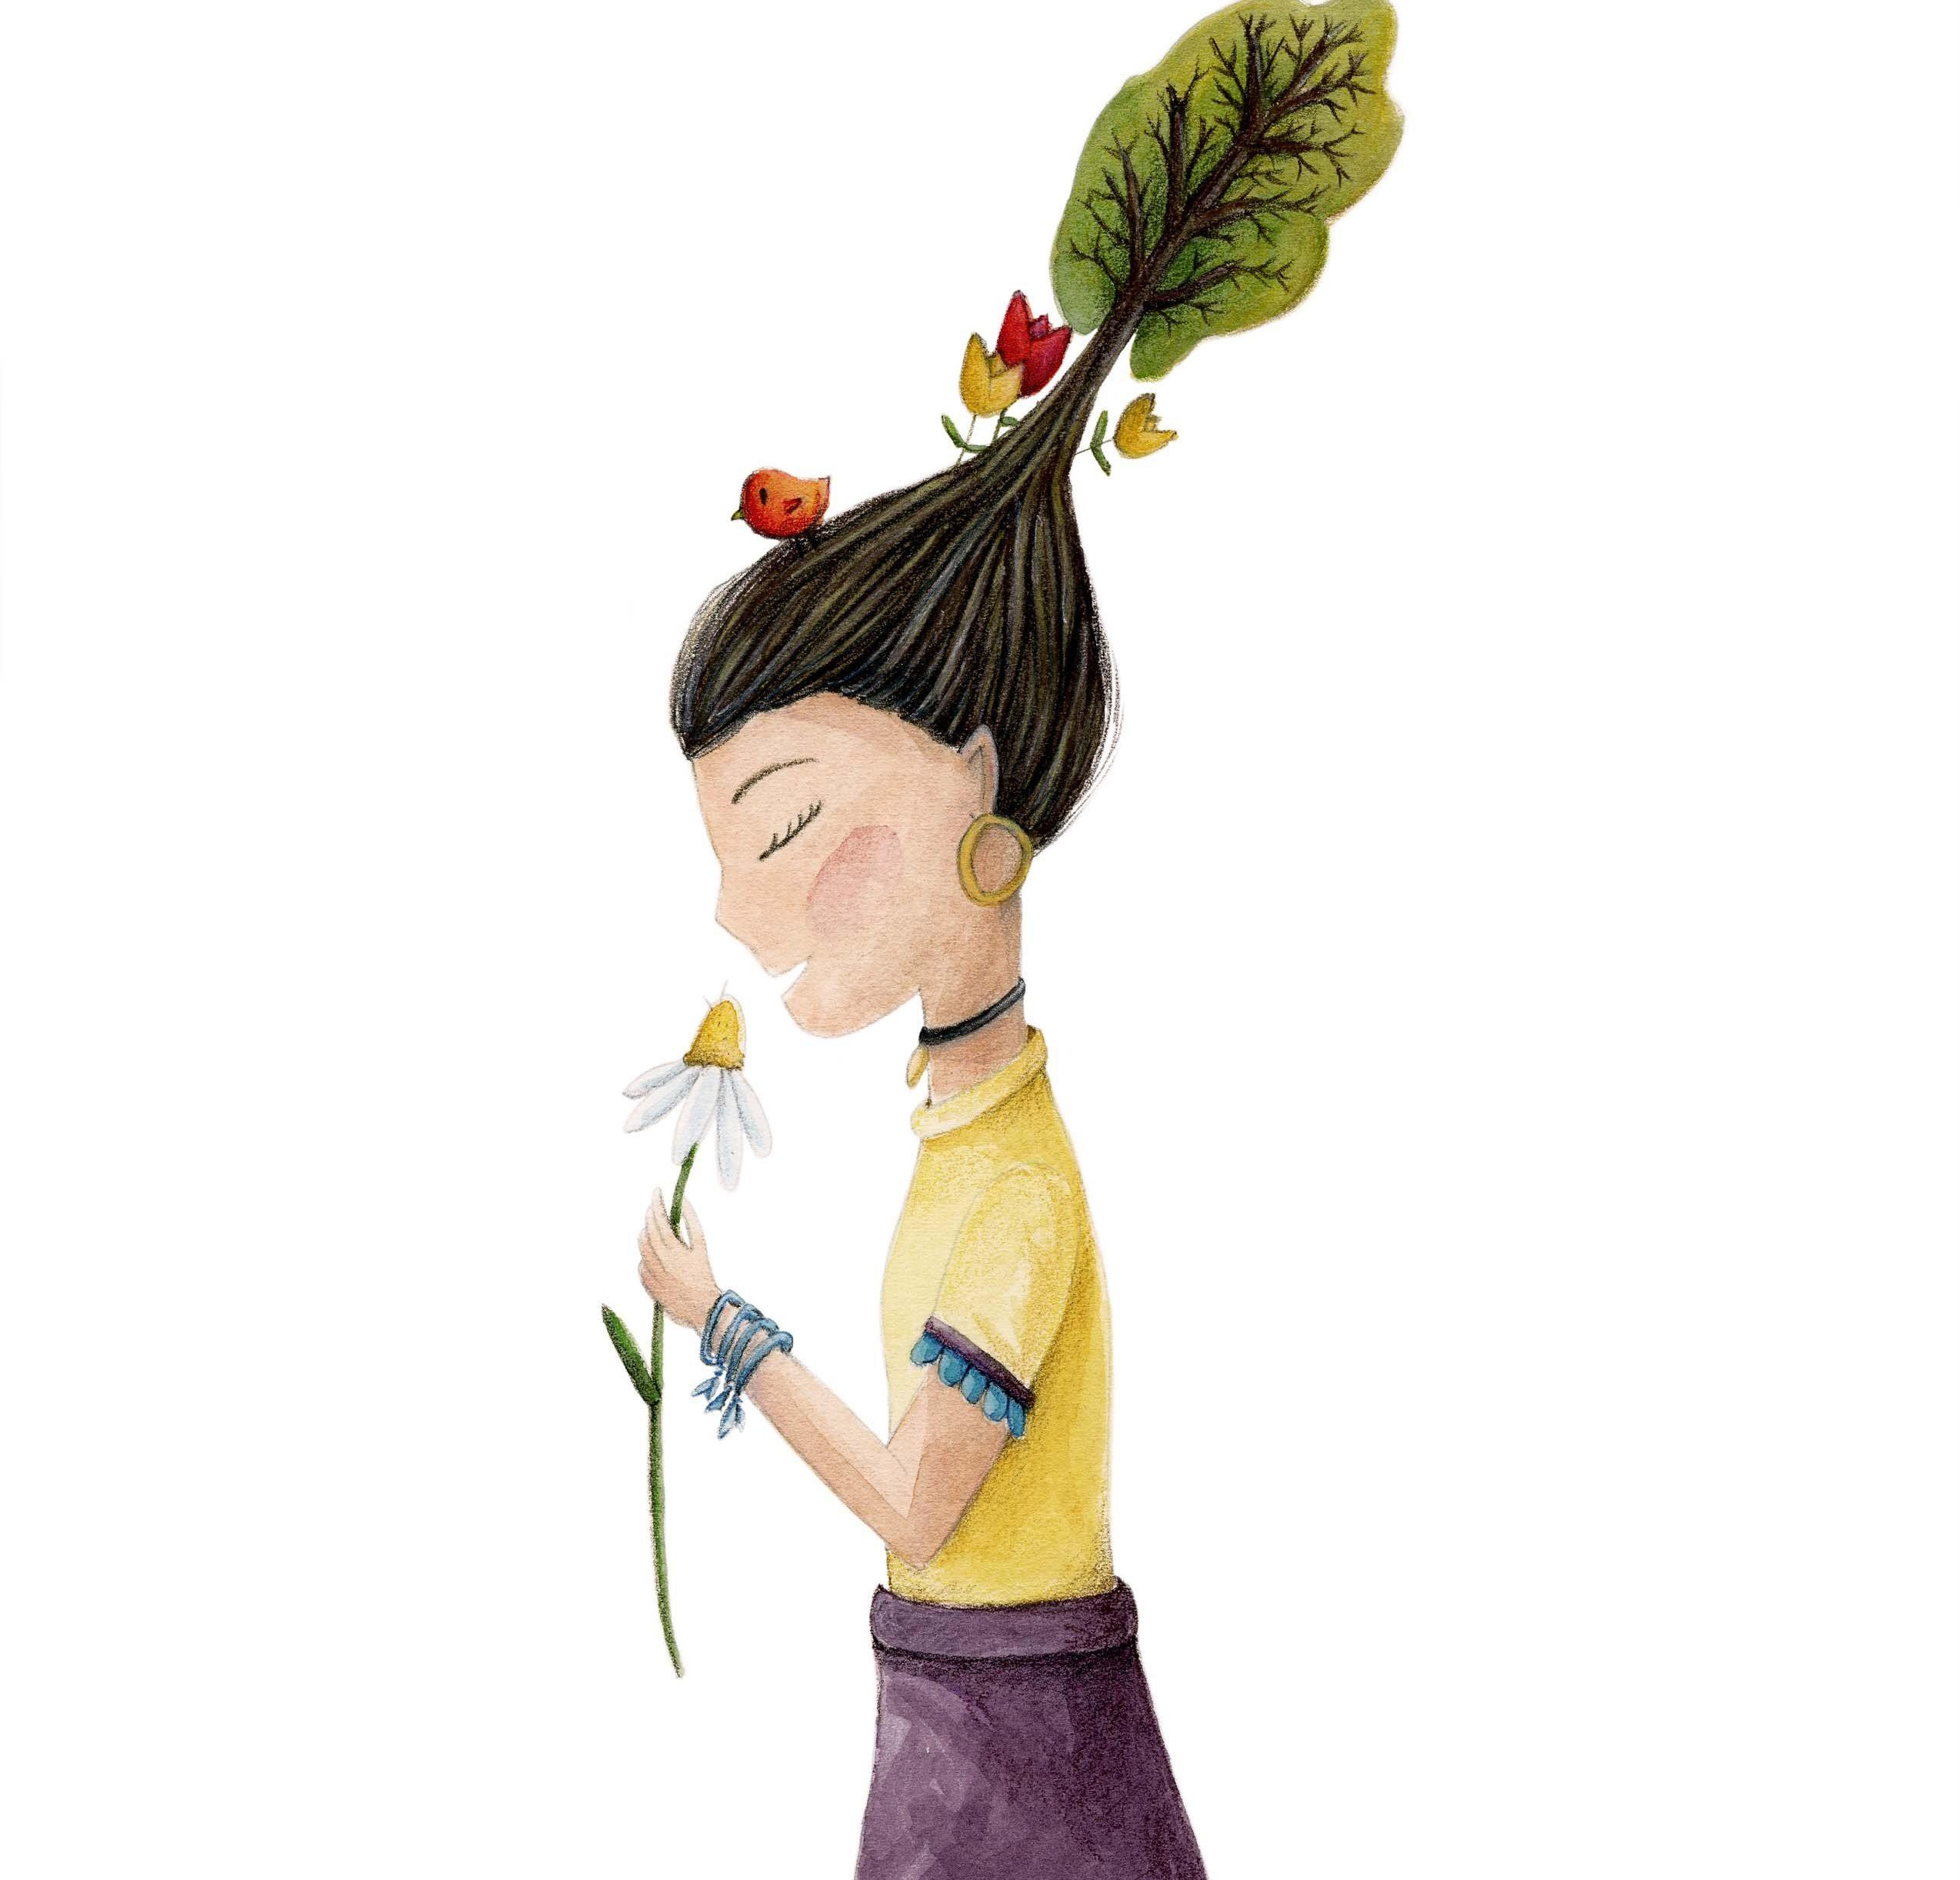 Isabelle Sirois illustrations